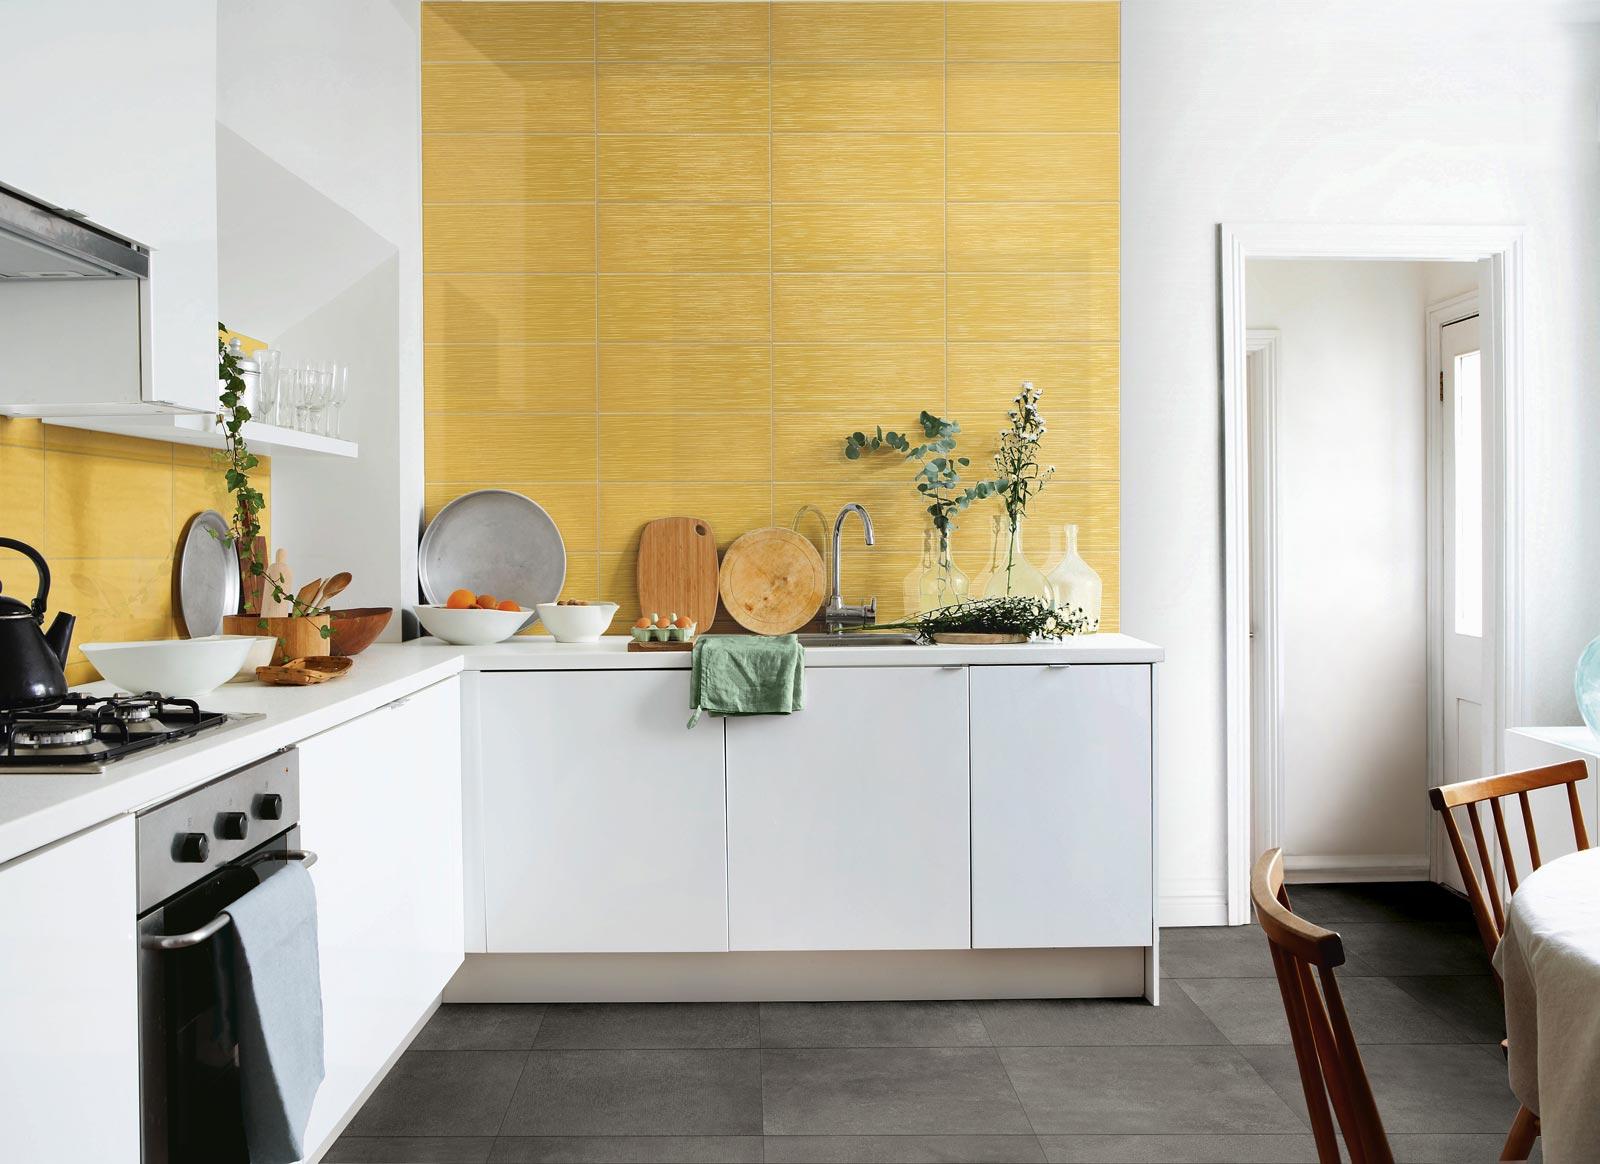 Piastrelle bagno gialle fabulous fap ceramiche meltin bagno with